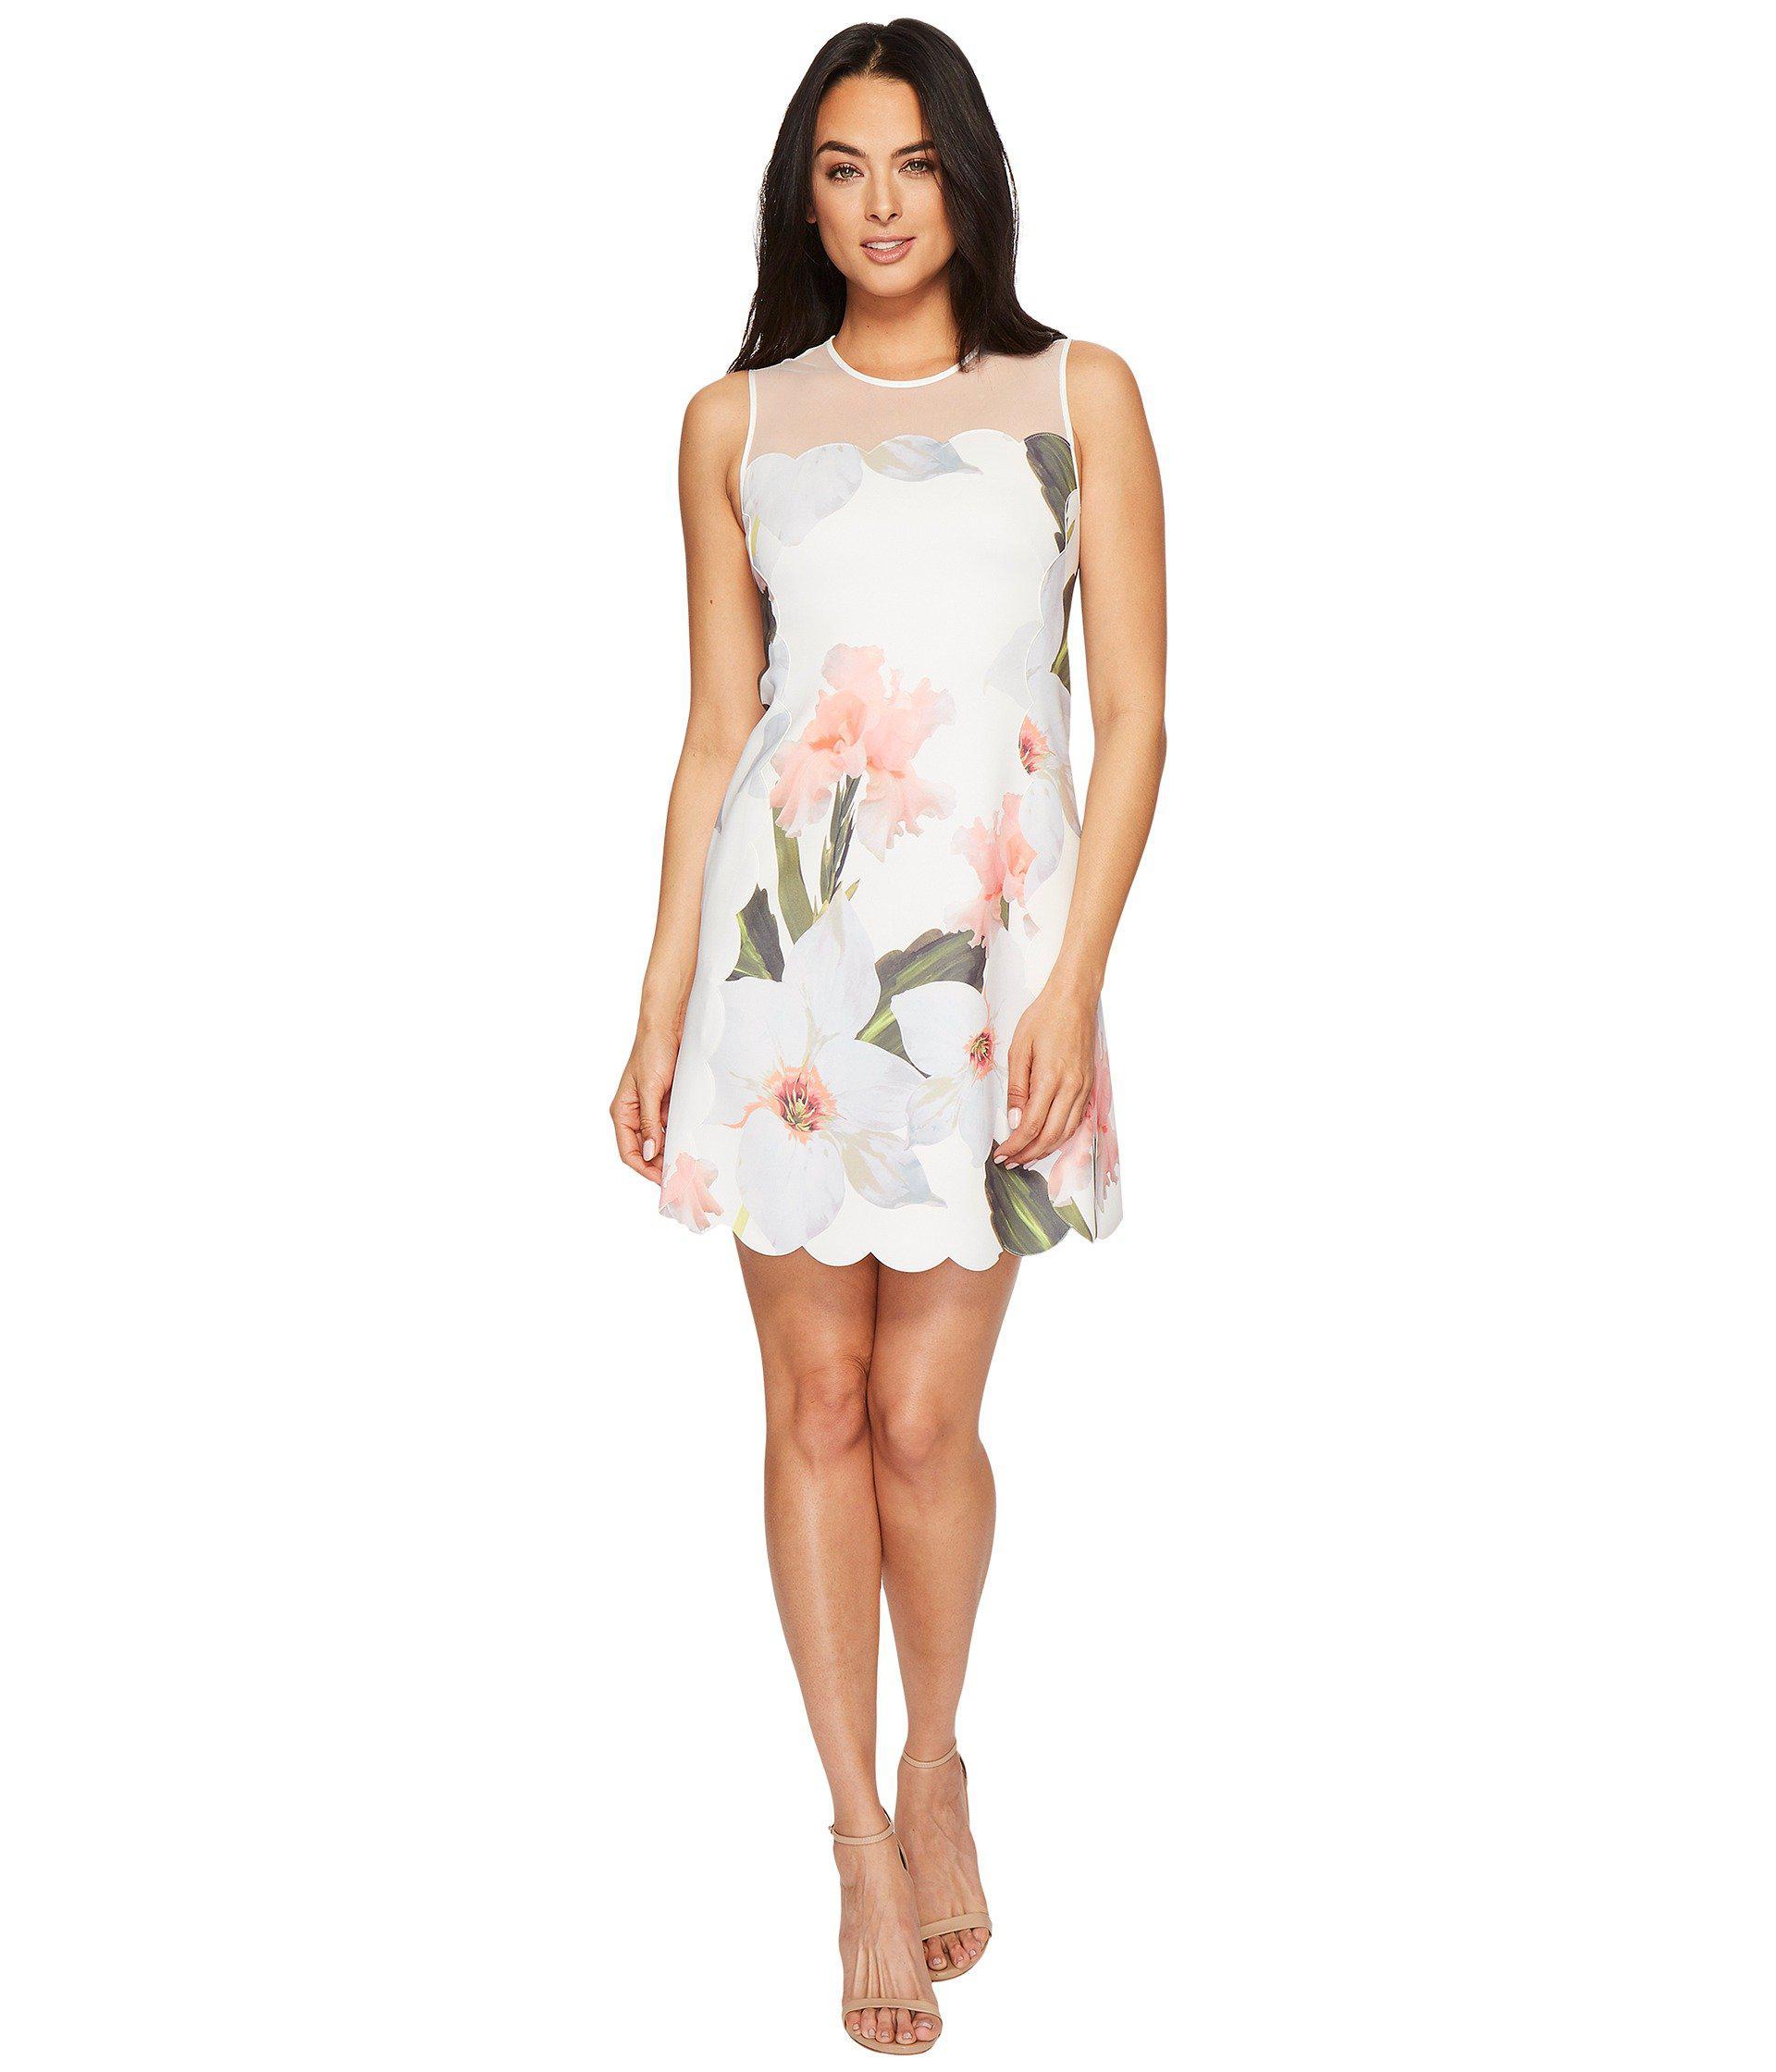 de0dd49460d Lyst - Ted Baker Caprila Chatsworth Bloom Scallop Tunic in White ...